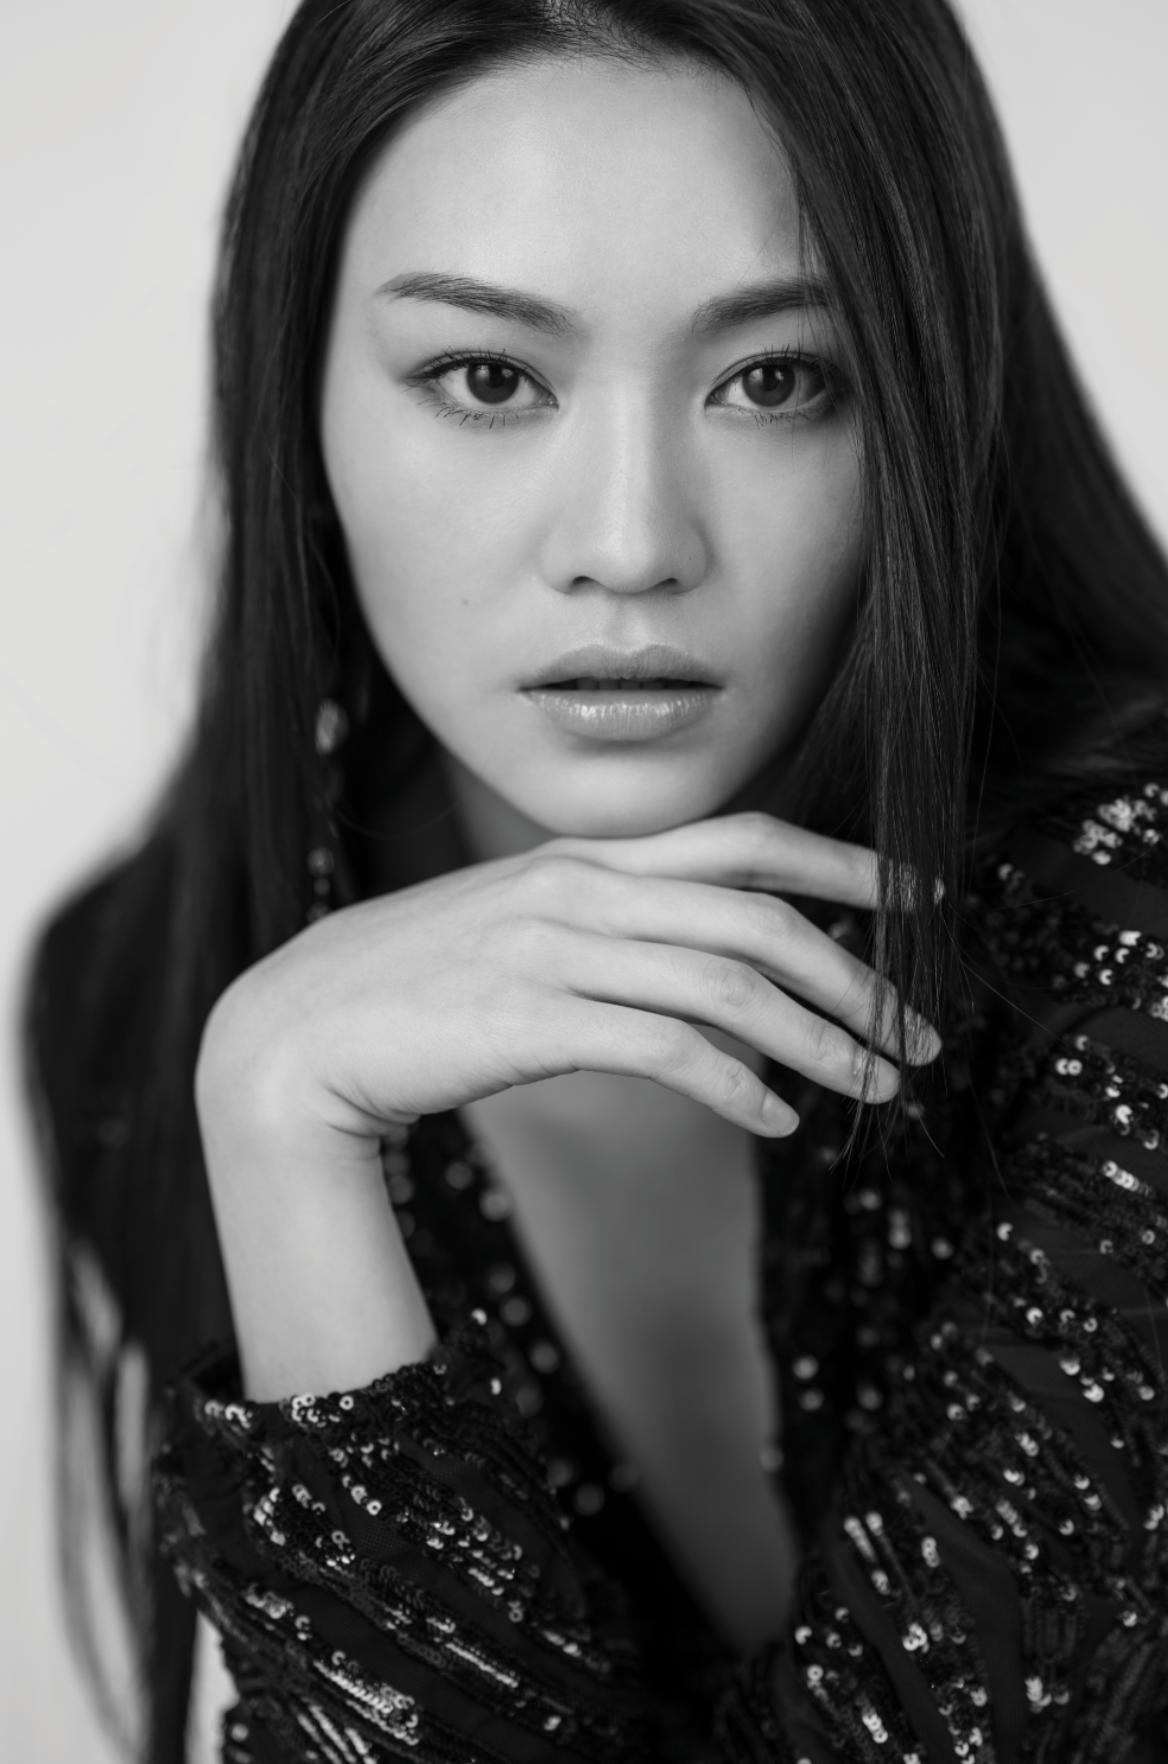 woman portrait photo fashion fine art artistic hk